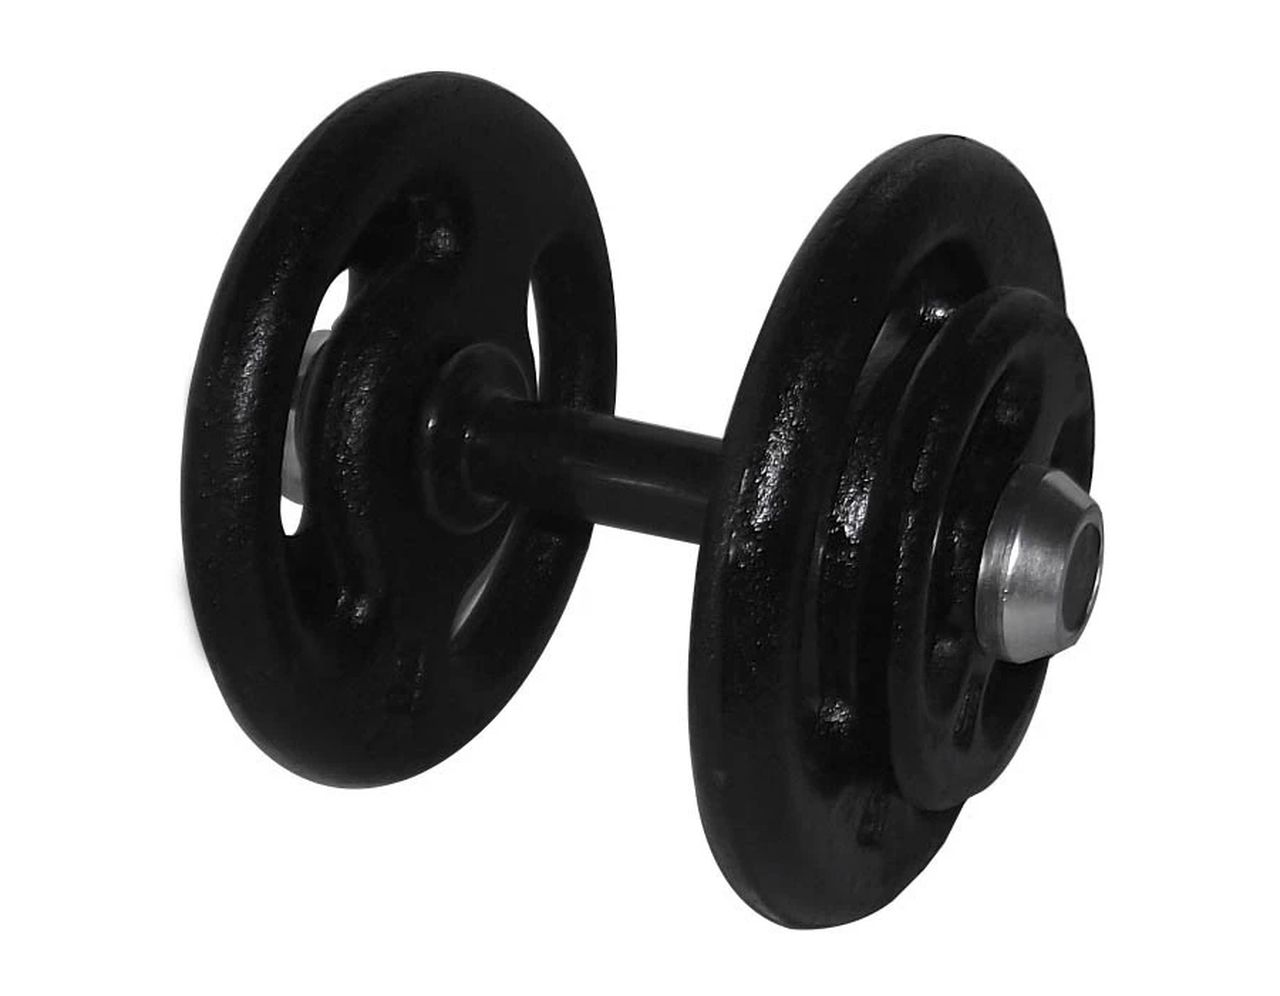 Dumbbell Pintado Pegada Emborrachada Academia Fitness 24kg  - Panela de Ferro Fundido